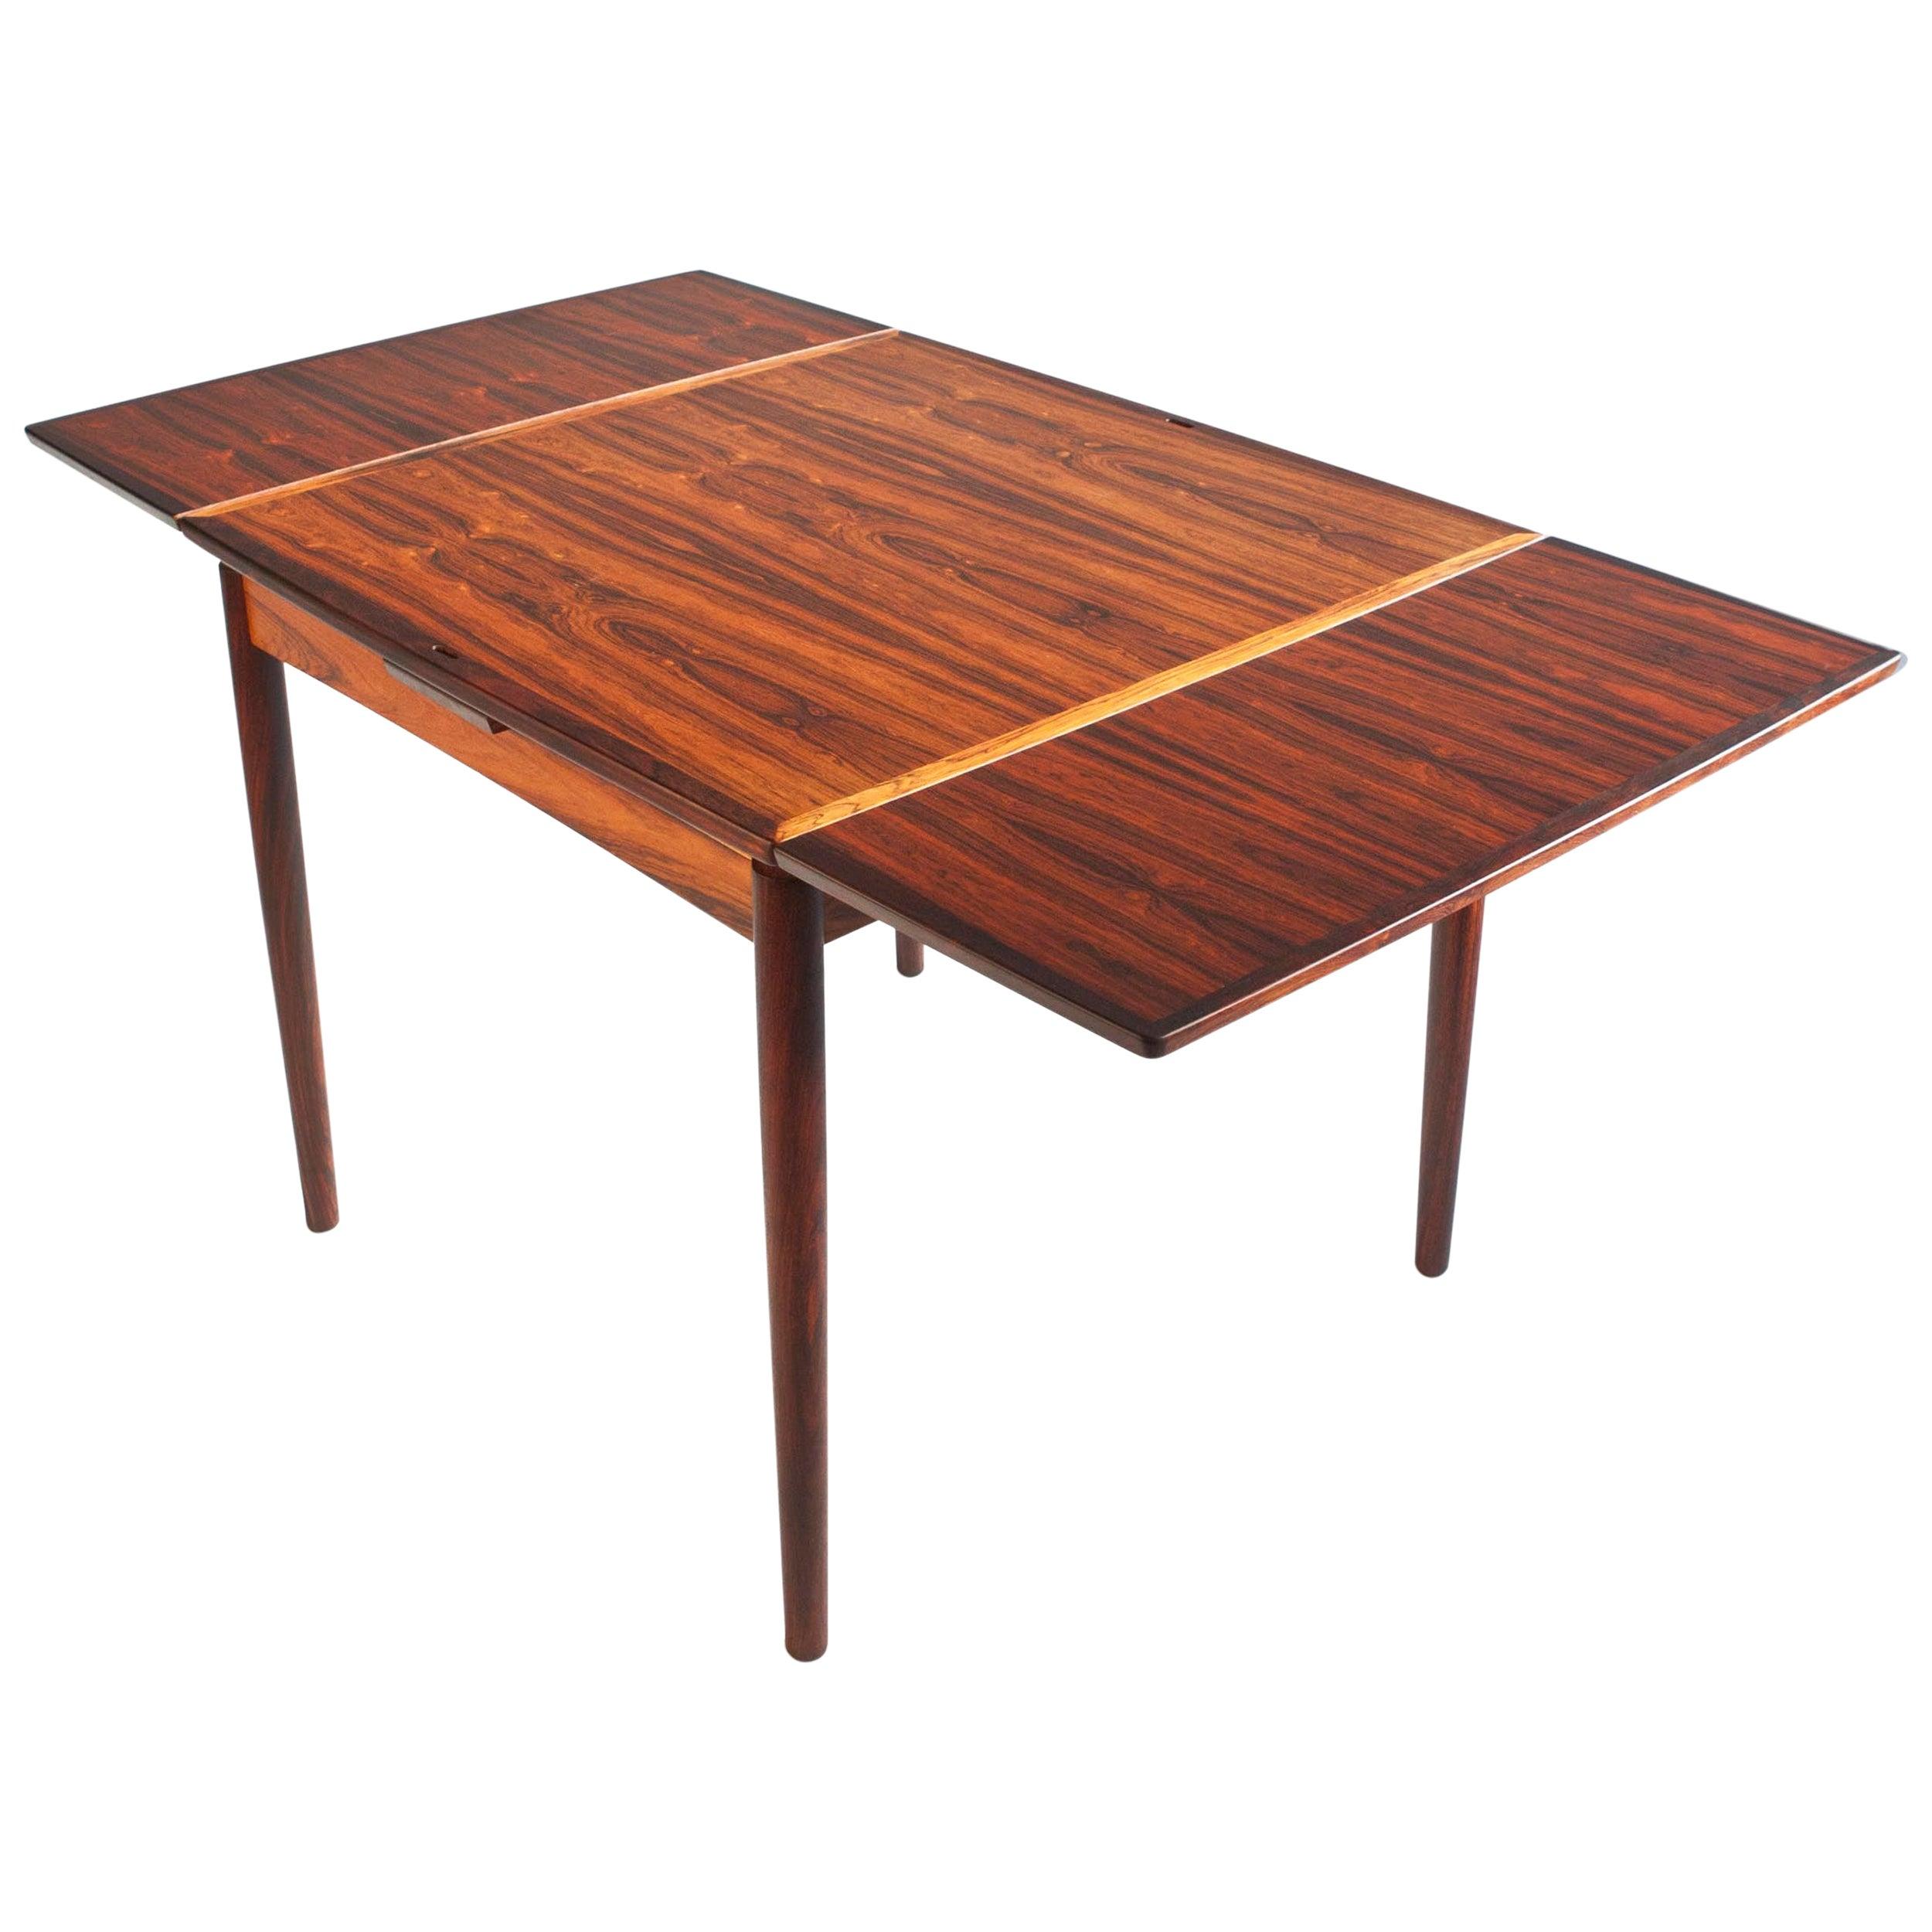 Carlo Jensen for Hundevad & Co. Brazilian Rosewood Flip-Top Table, Denmark 1960s